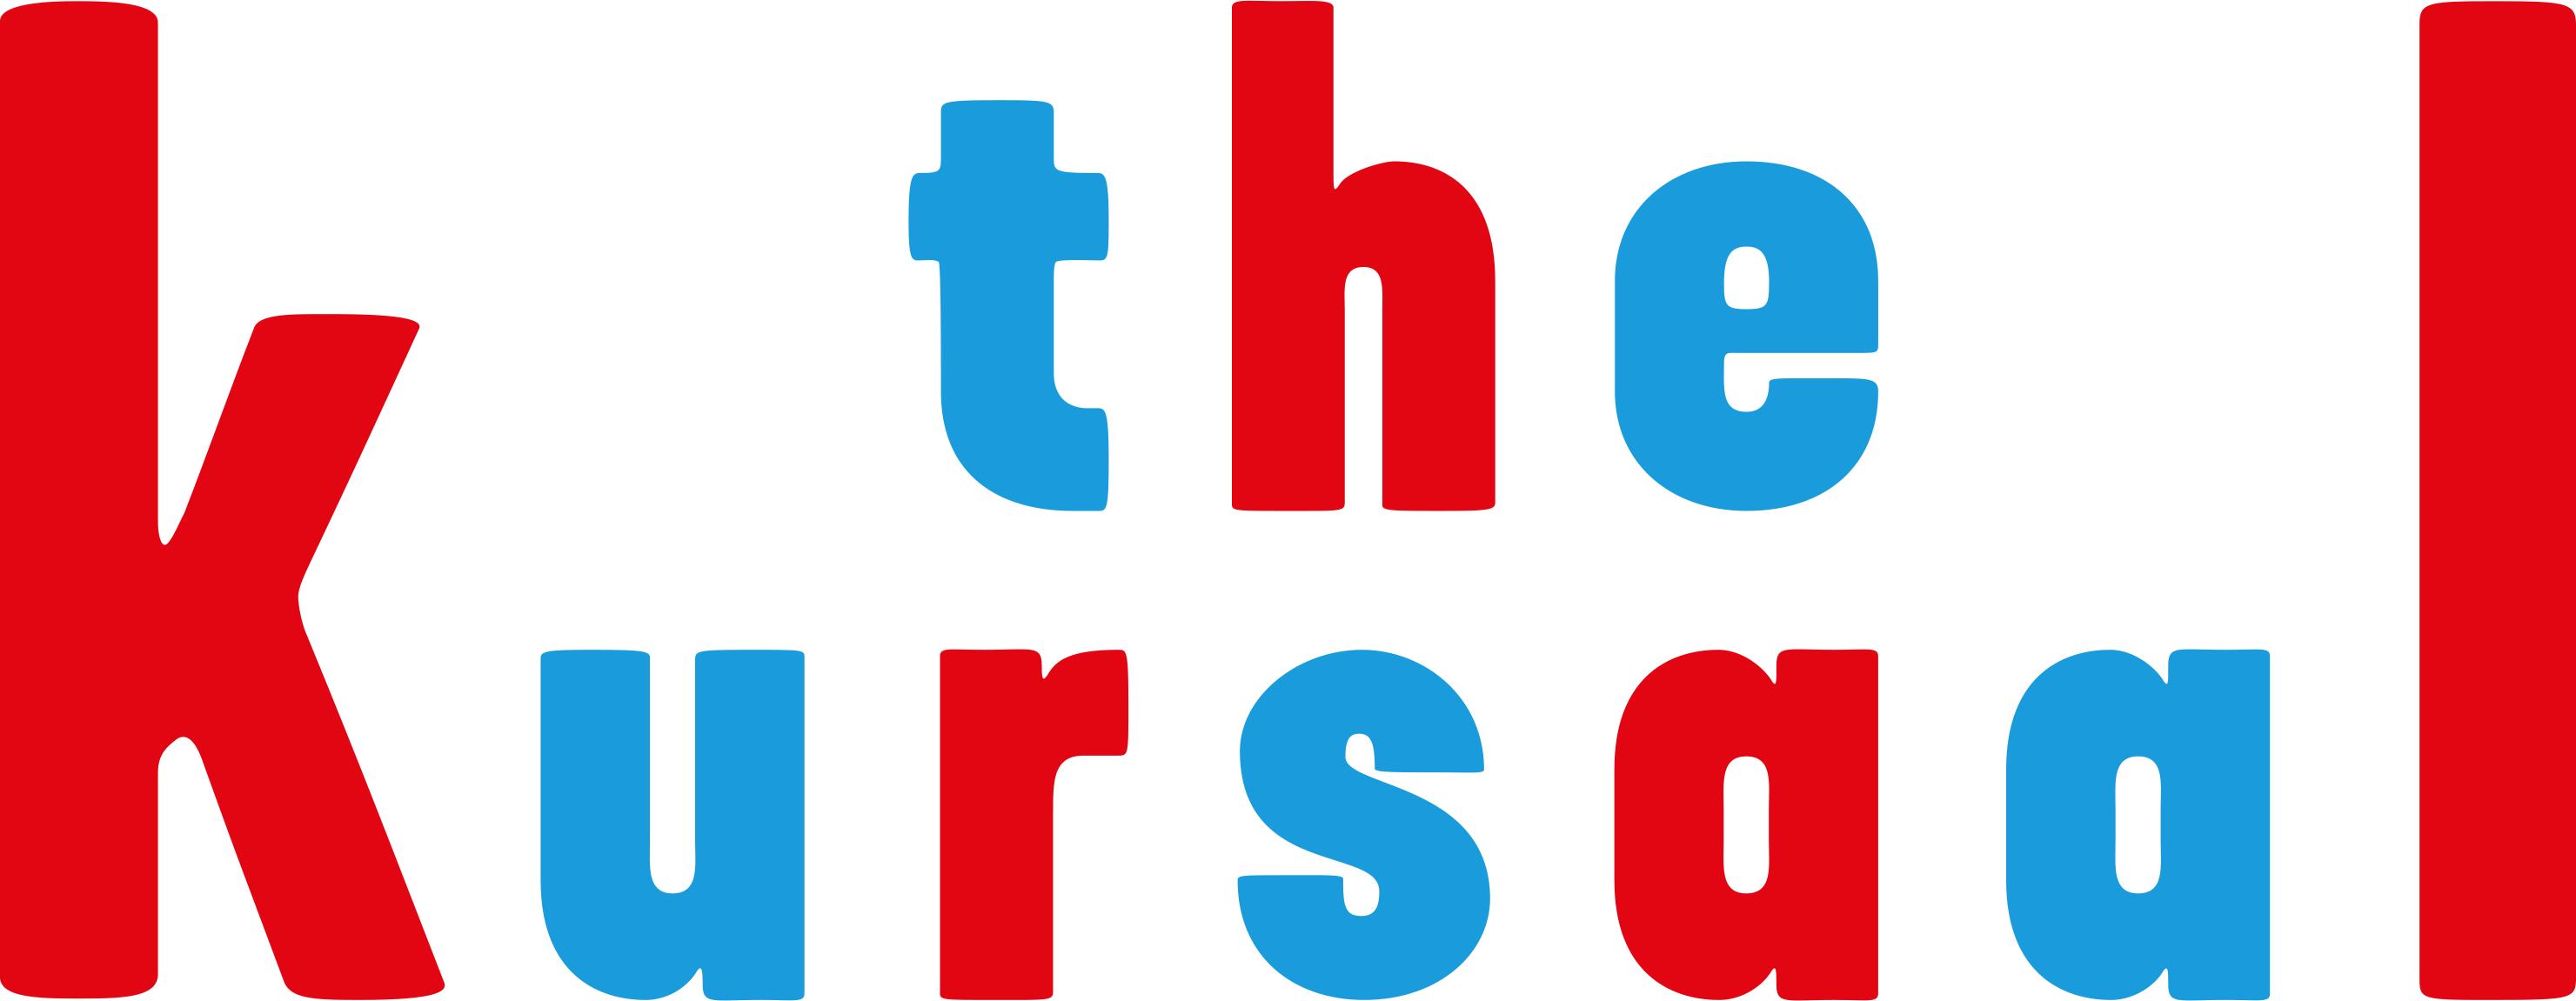 Logo The Kursaal